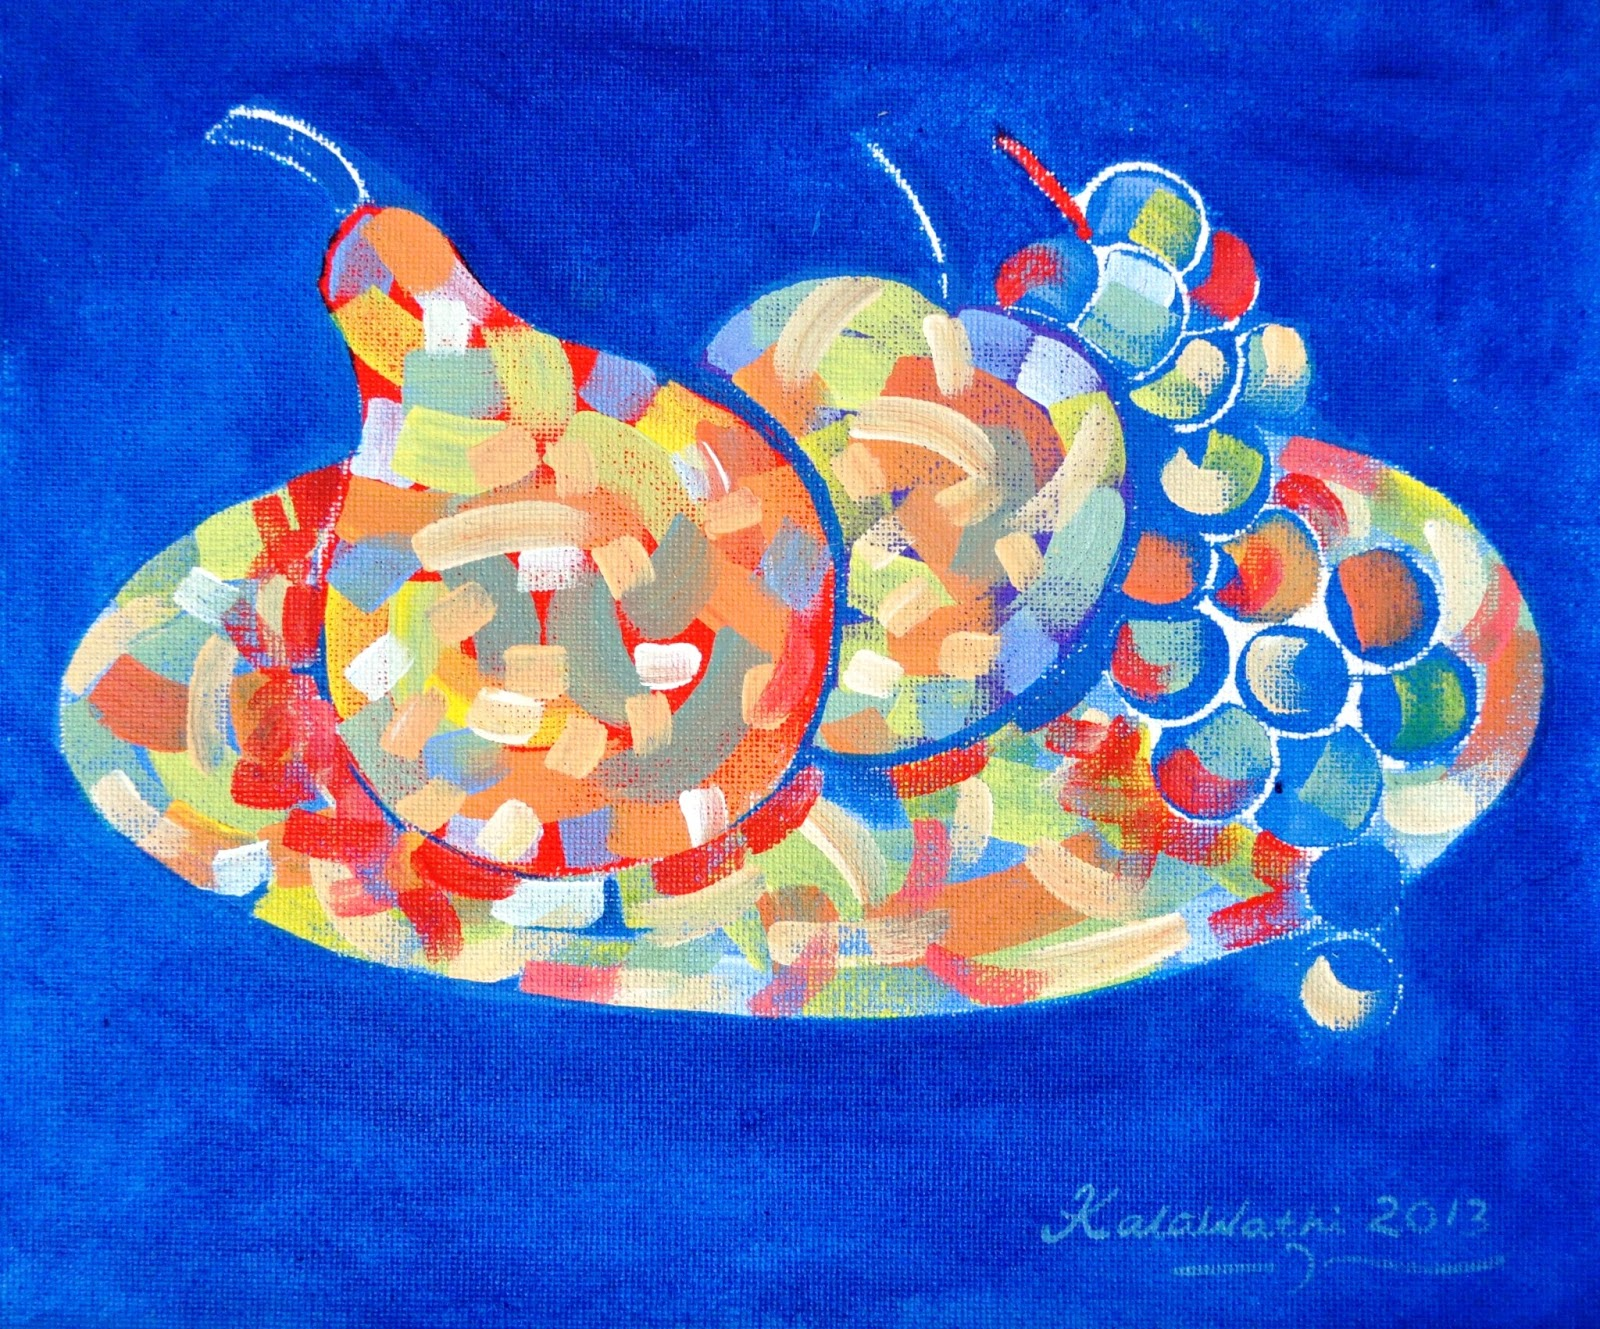 Kalawathi Kunst Vangogh Stil Wassily Kandinsky Stil Pointillismus